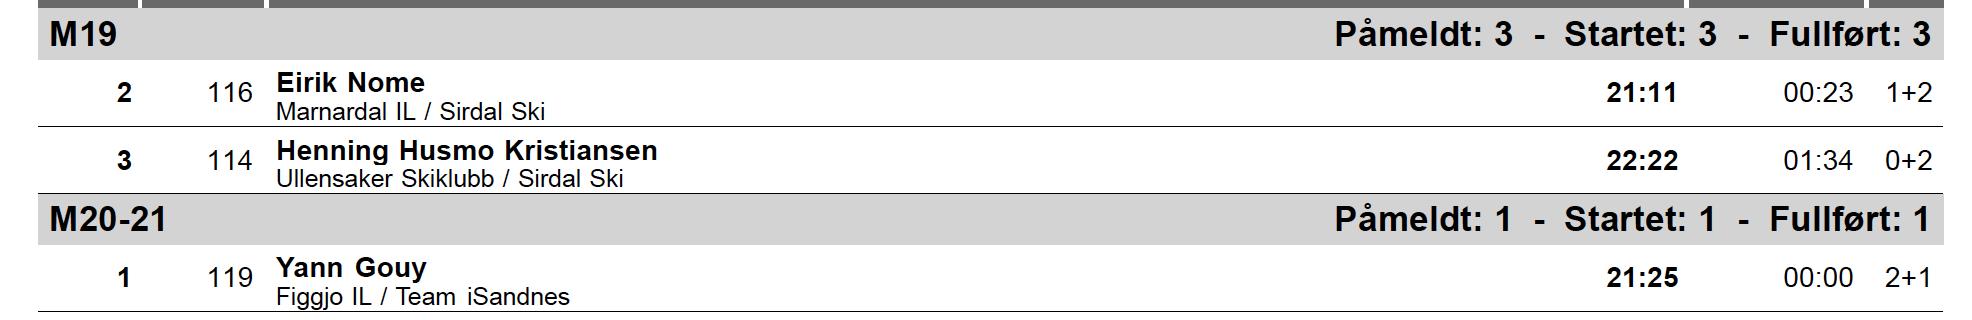 Macintosh HD:Users:Lsir:Dropbox:Skjermbilder:Skjermbilde 2019-01-20 23.04.25.png